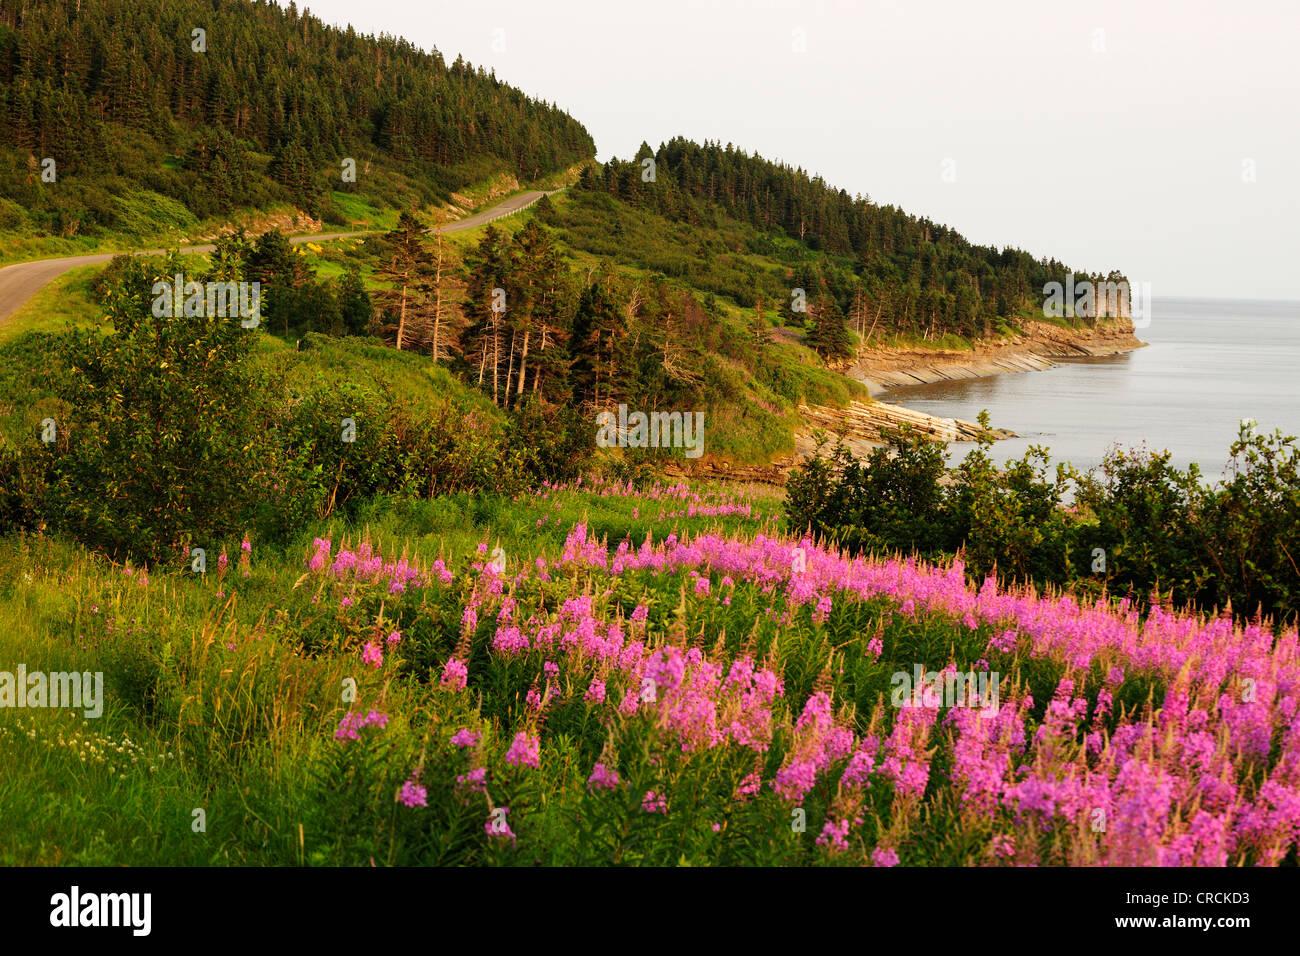 Coast, Forillon National Park, Gaspésie or Gaspé Peninsula, Quebec, Canada - Stock Image